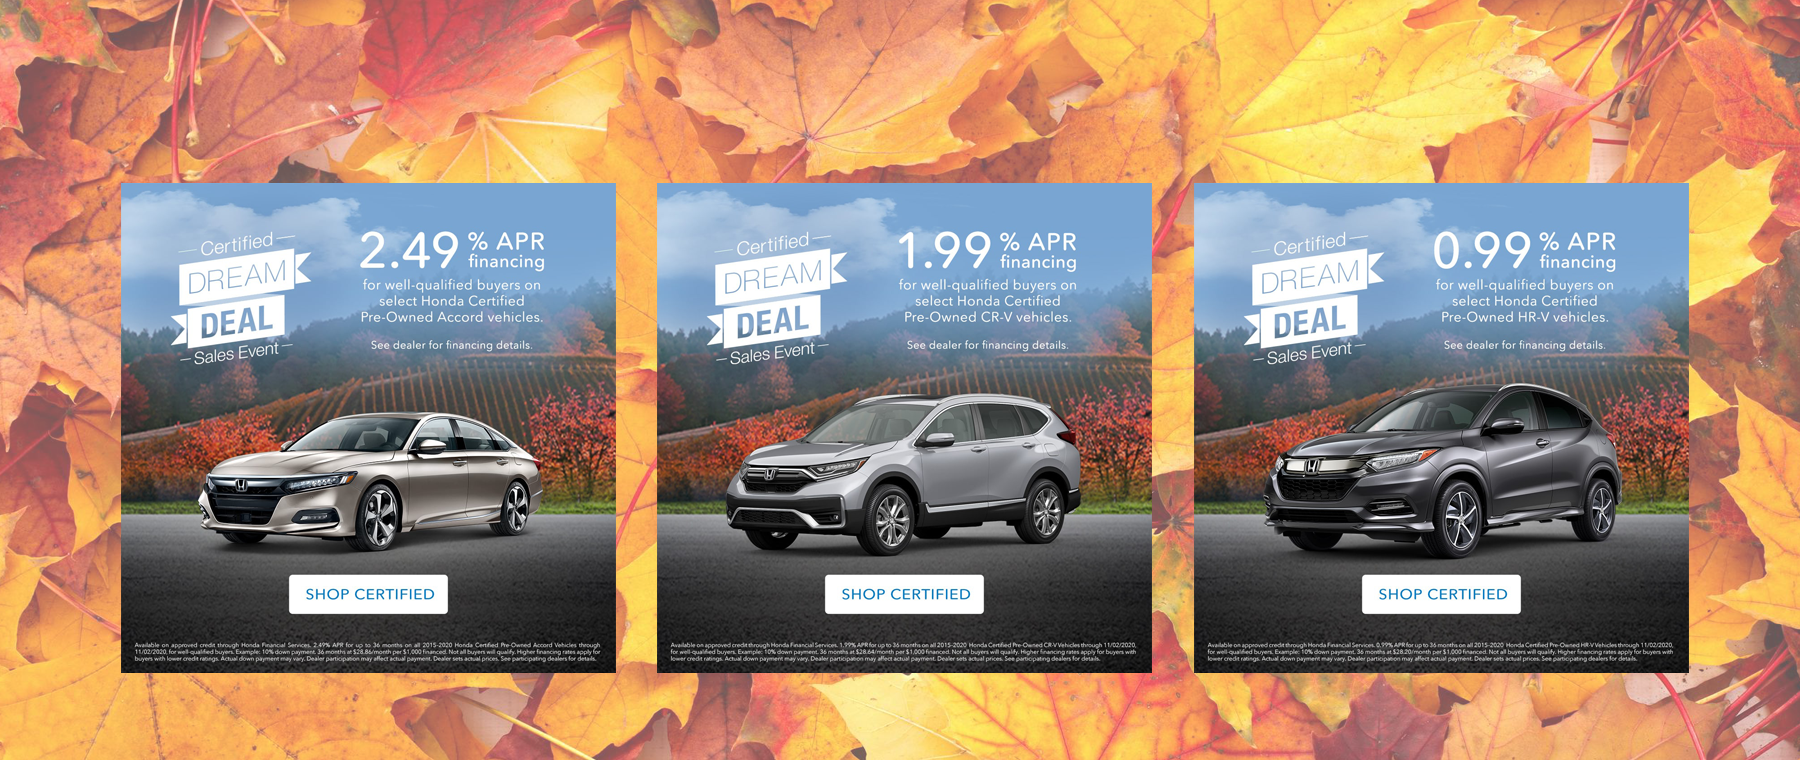 Fall Honda Certified Dream Deal Sales Event